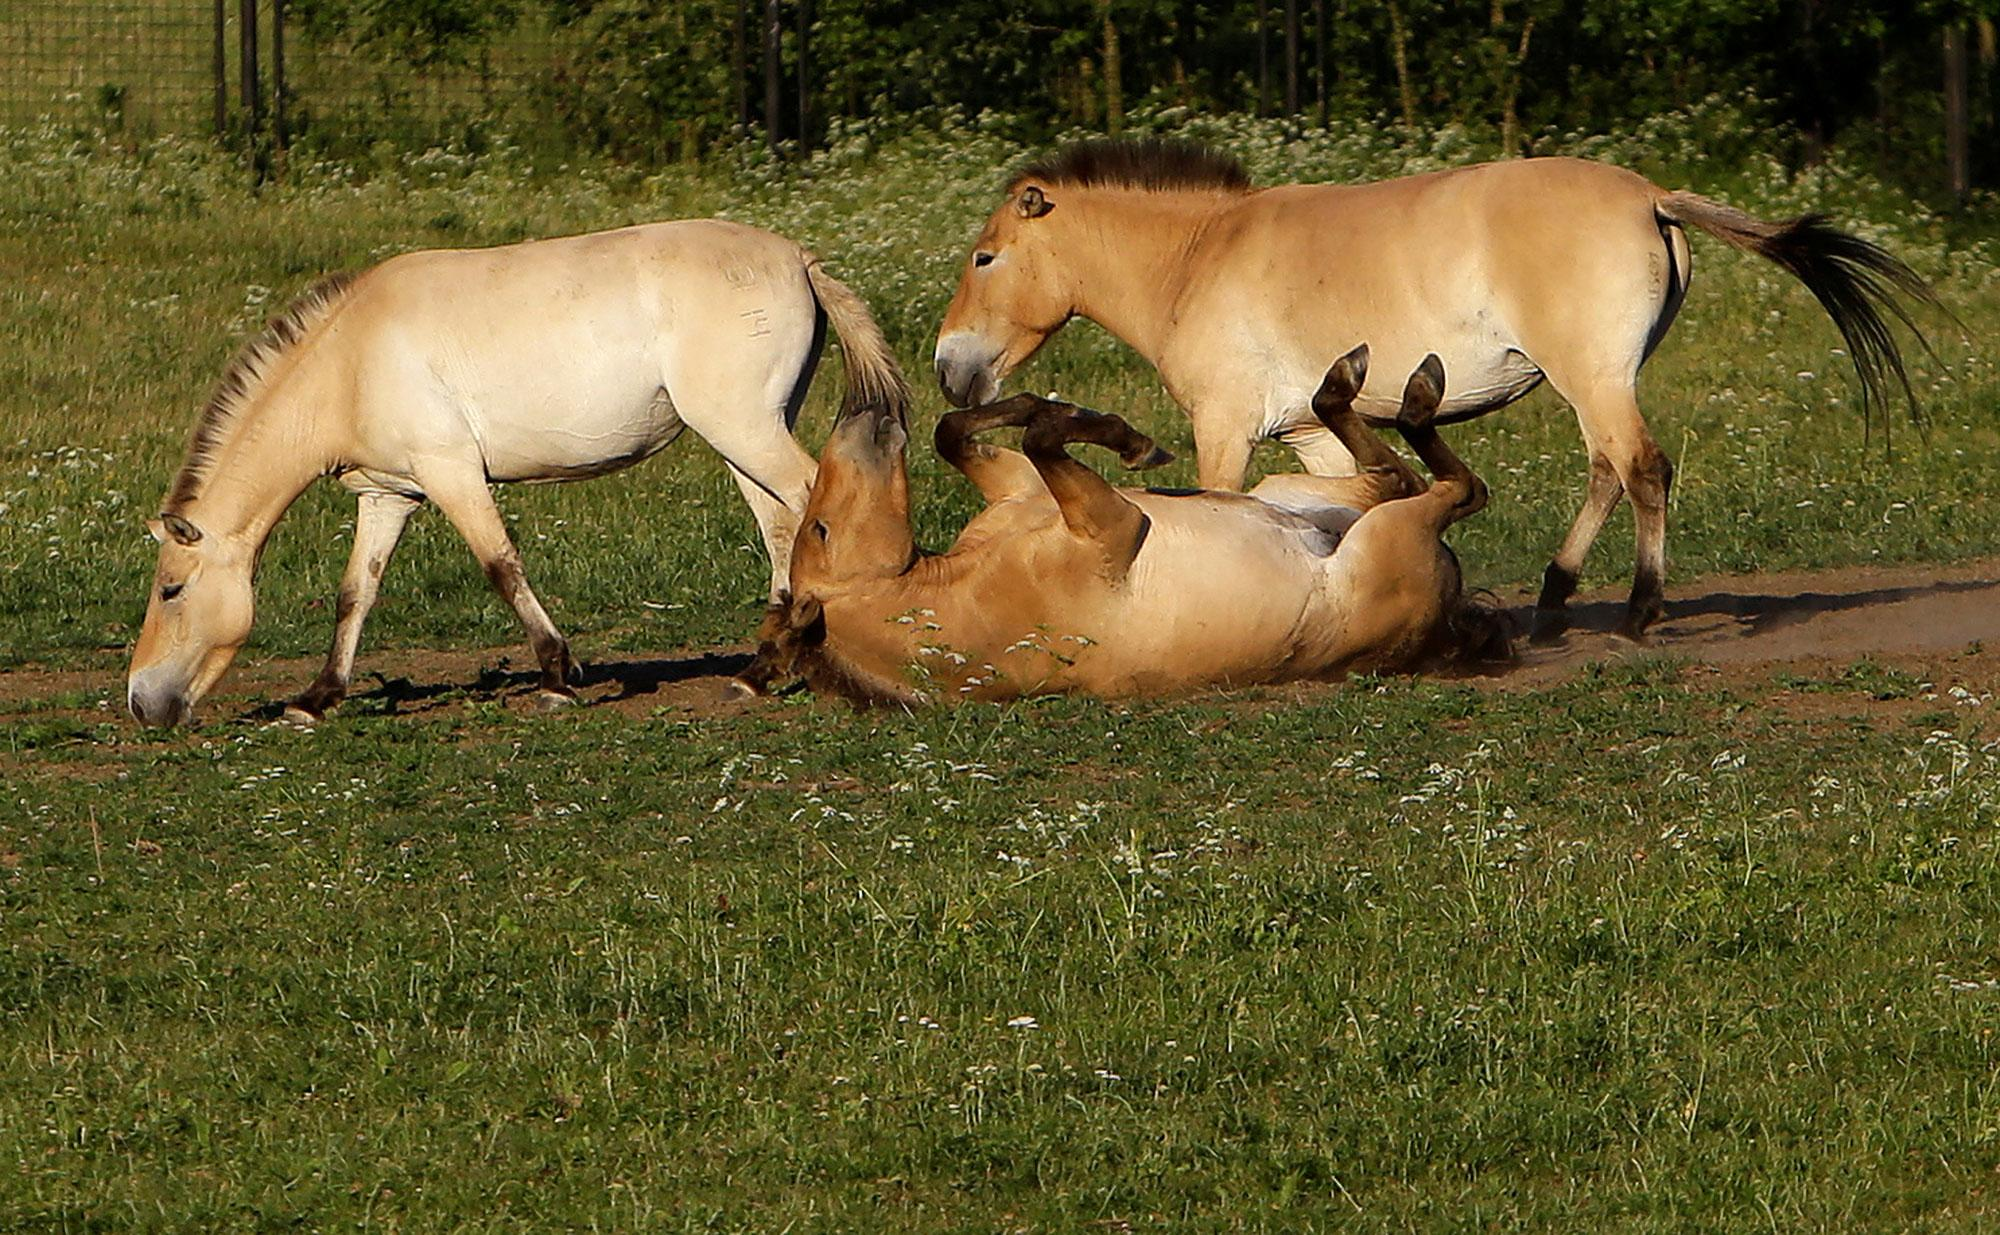 <p>Przewalski's horses graze on a meadow at the acclimatization enclosure in the village of Dolni Dobrejov near the city of Tabor, Czech Republic, June 18, 2017. (Photo: David W. Cerny/Reuters) </p>